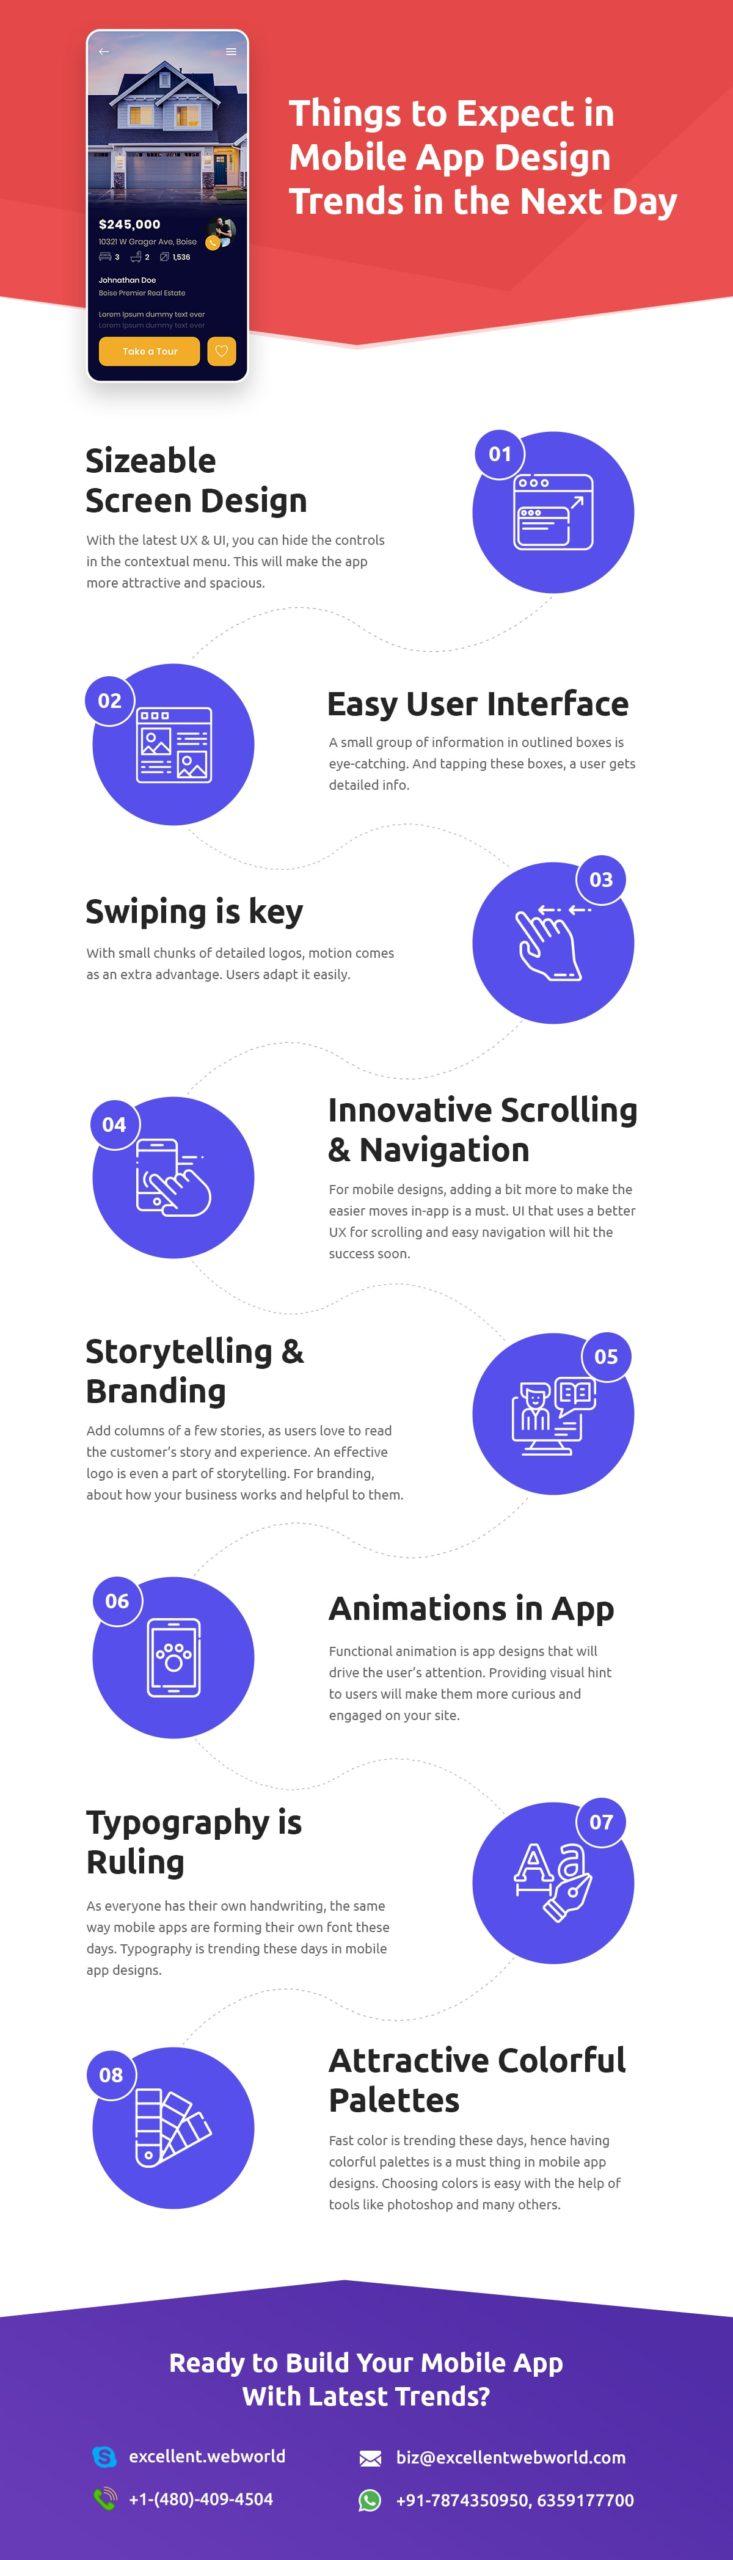 mobile app design trends infographic